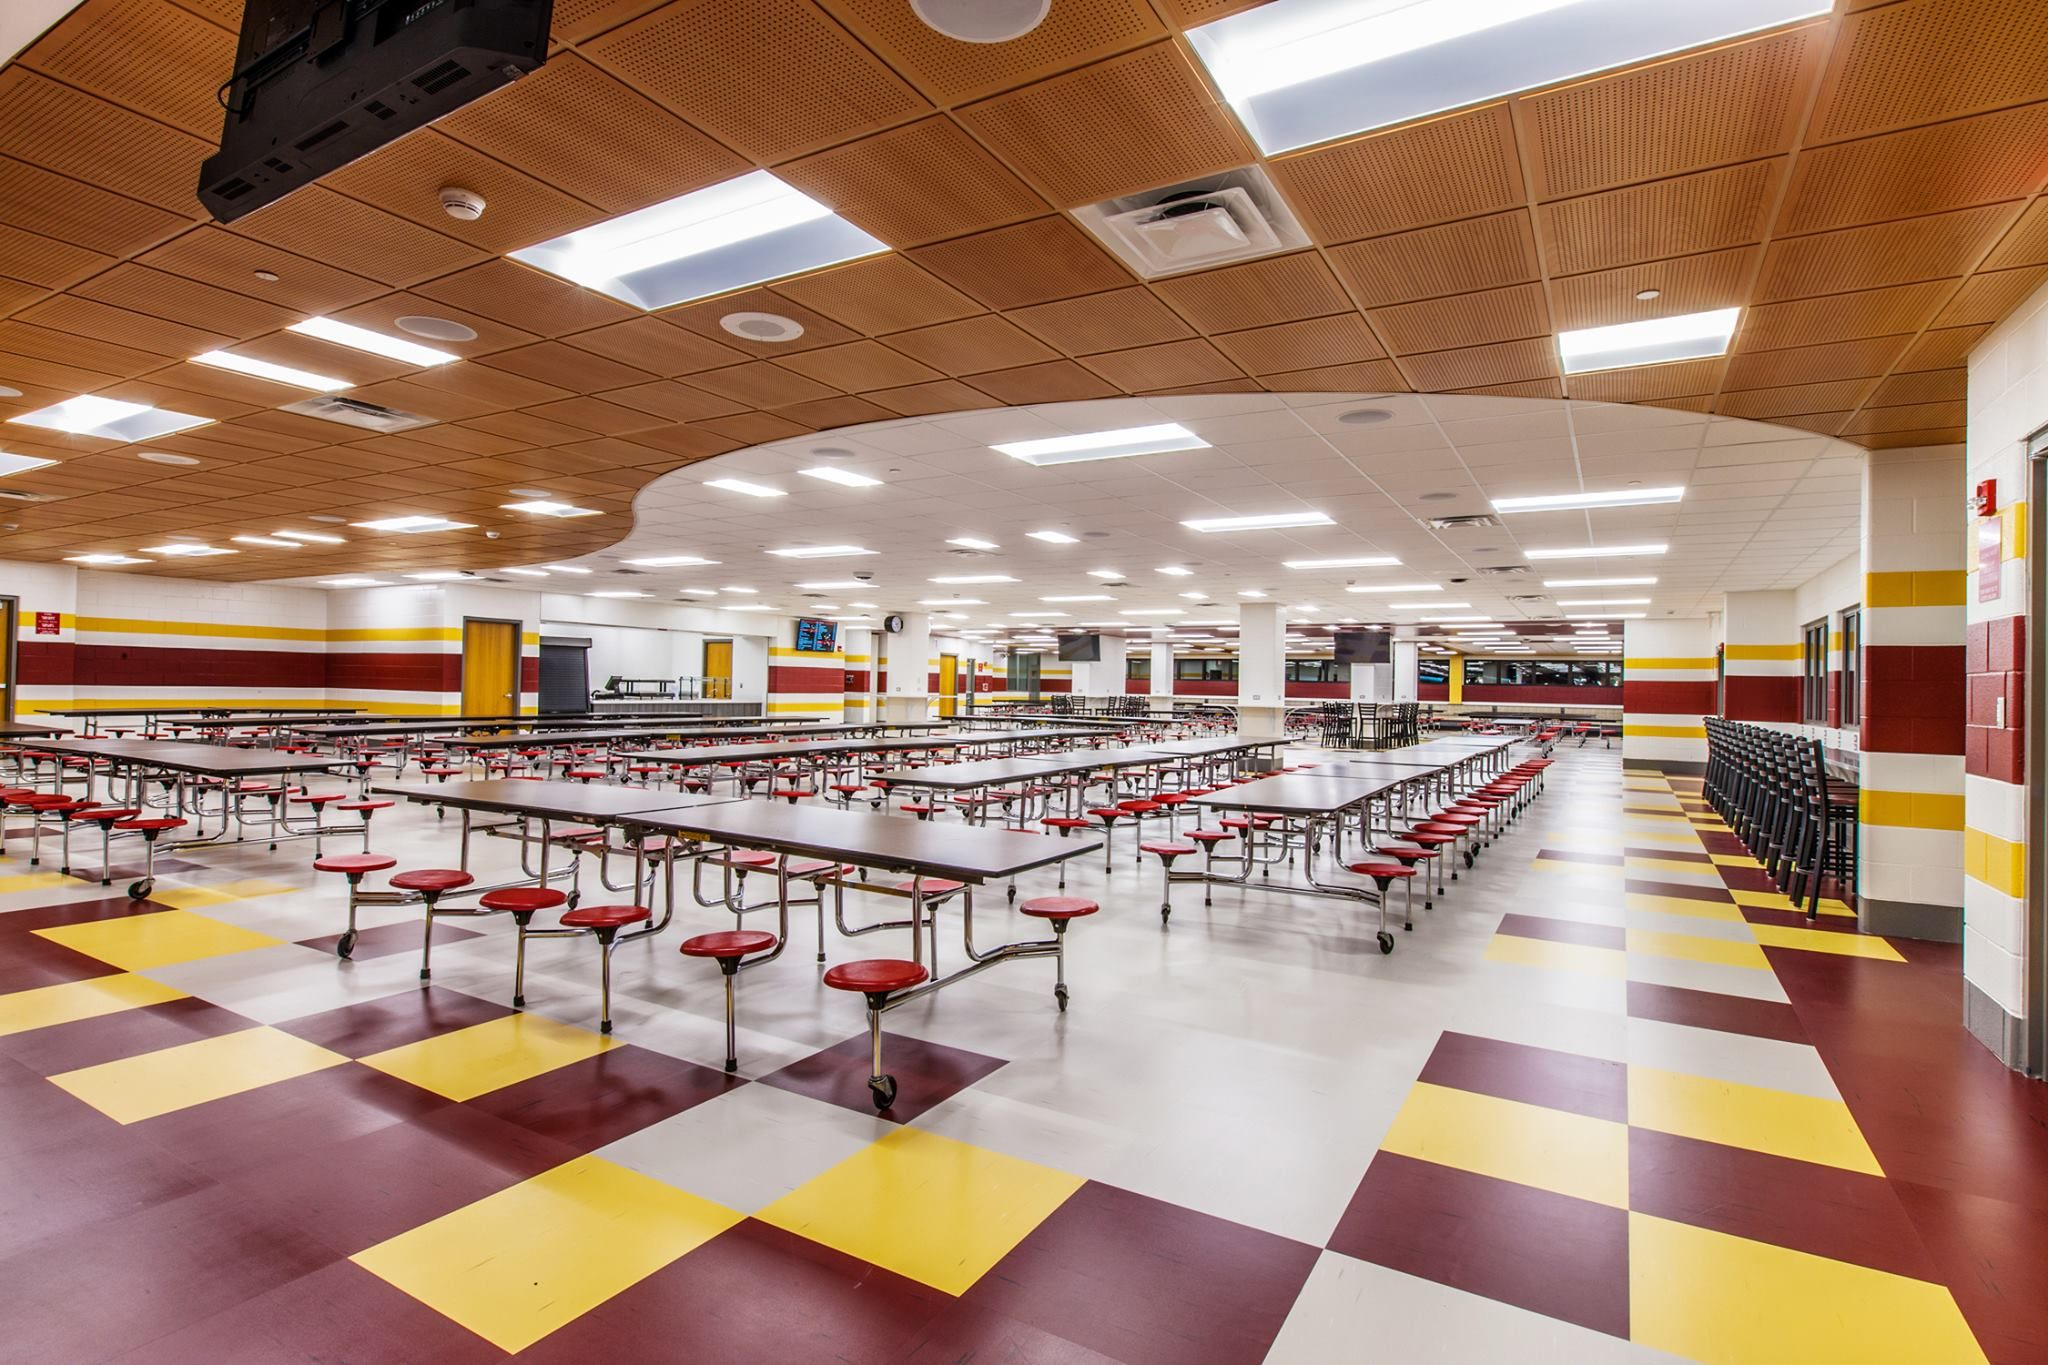 Schaumburg High School Il Rikett Quartz Tile Spartansurfaces Interiordesign Educationdesign